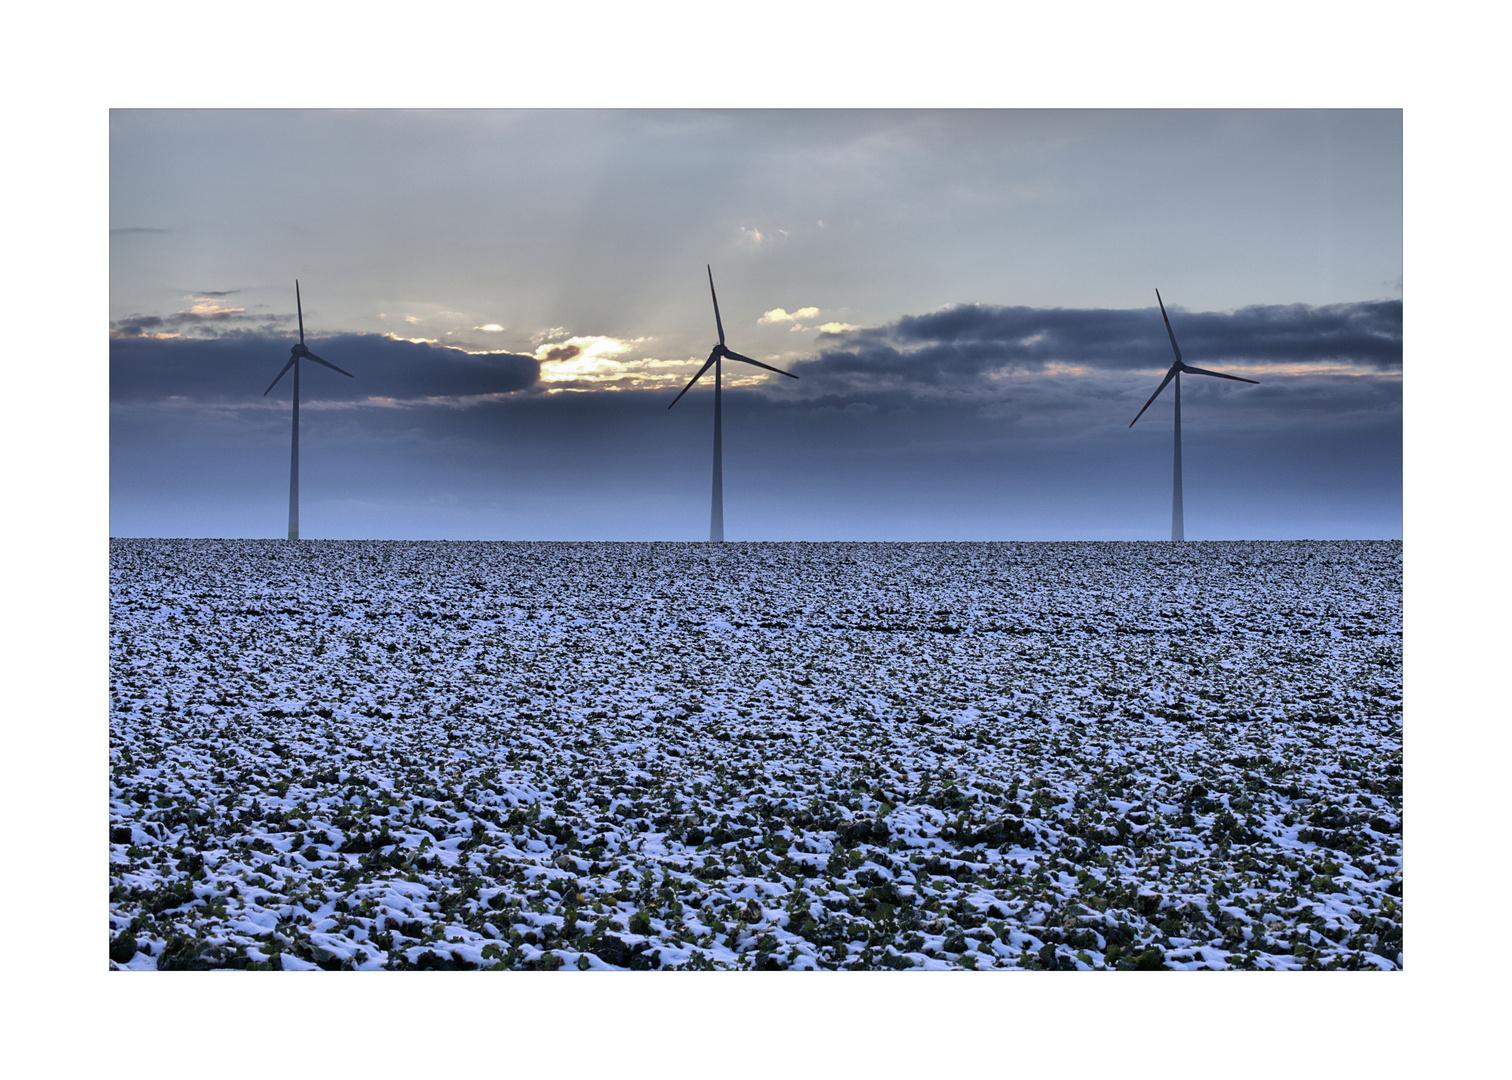 drei windräder im februar (2)